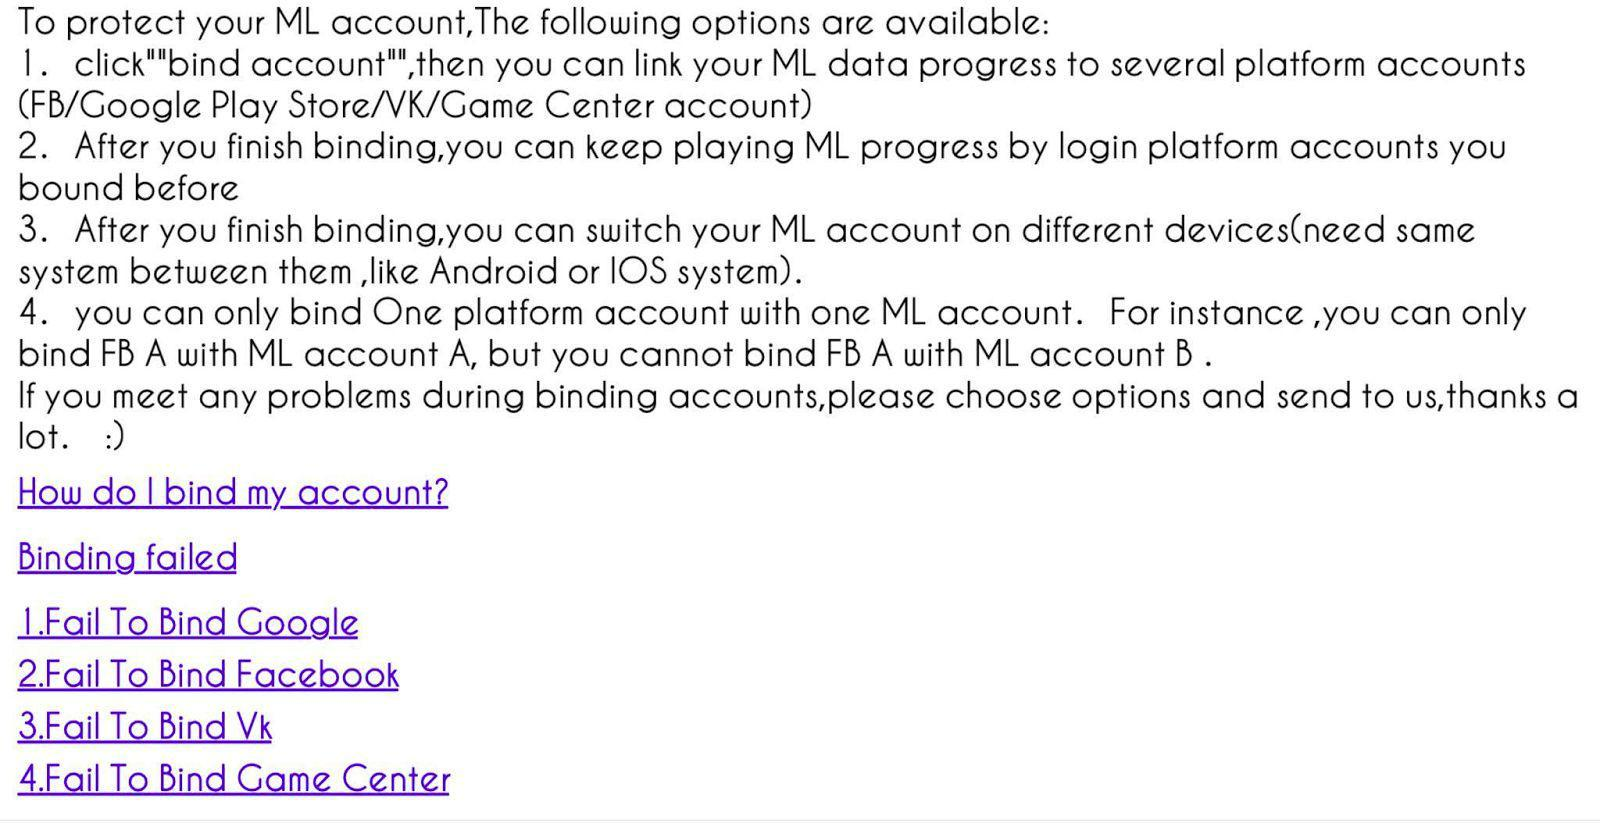 GUIDE] Account Problem - Bug Report - Mobile Legends: Bang Bang